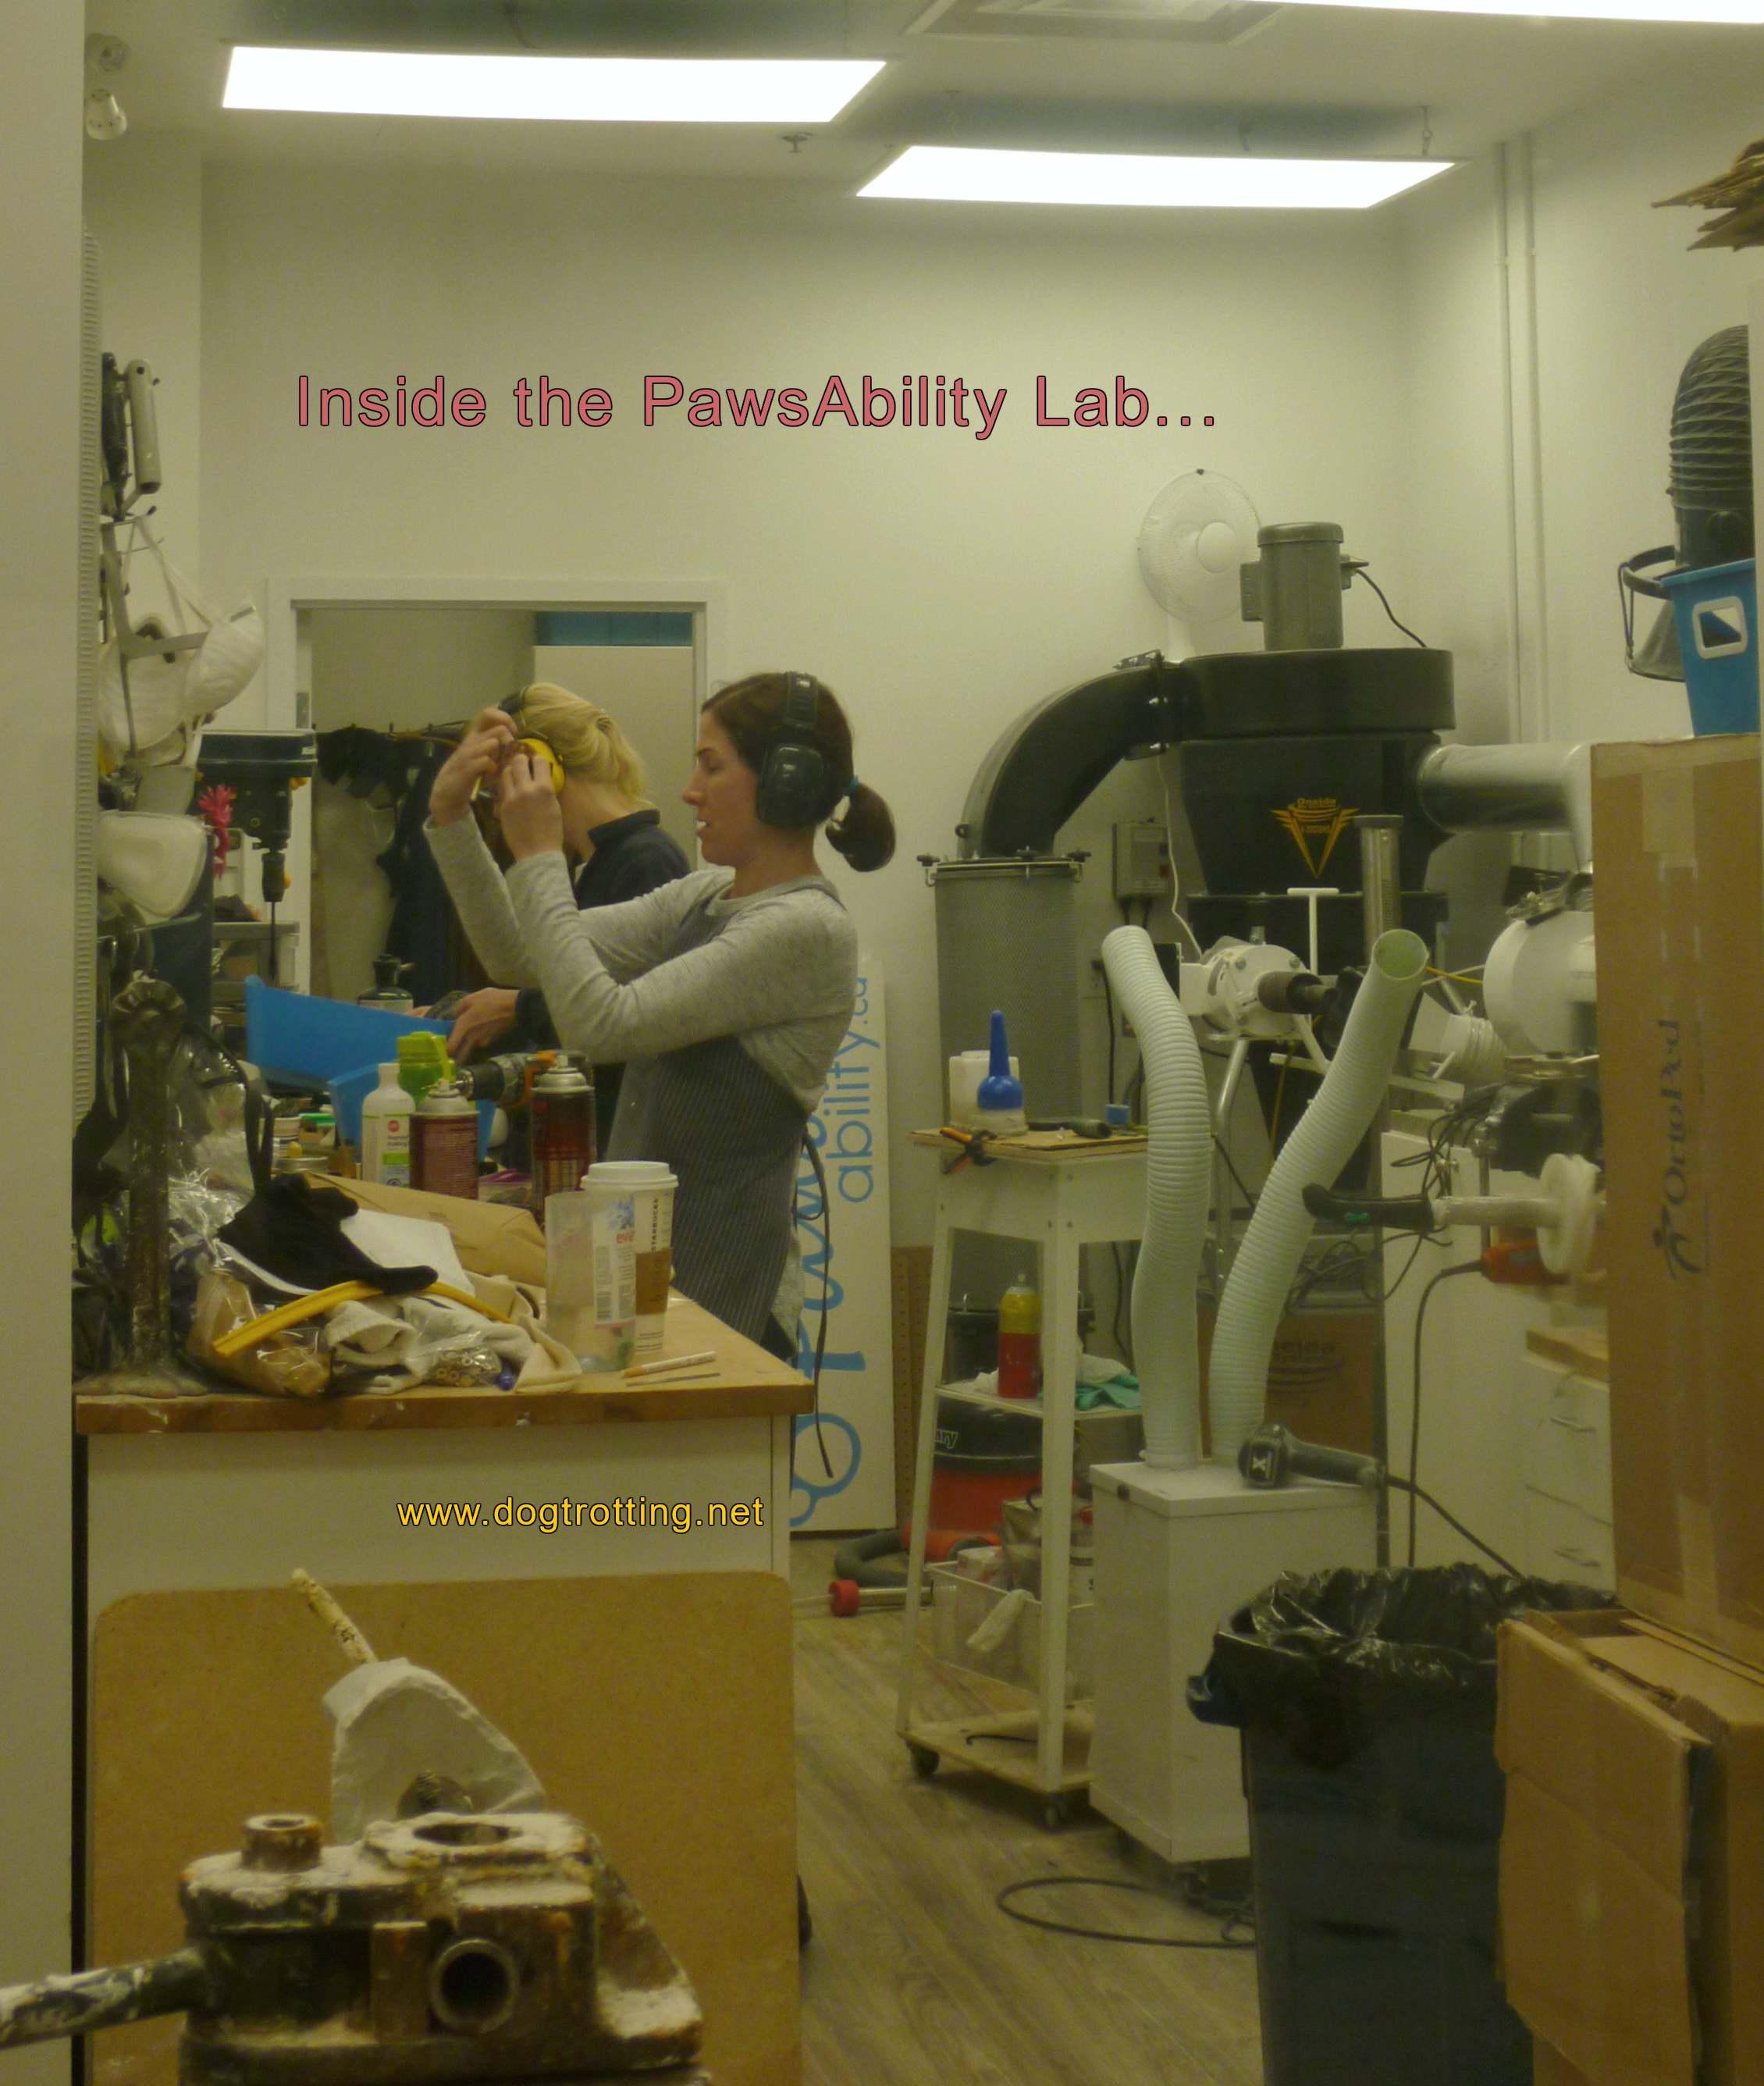 Inside the lab making animal prostetics at pawsability